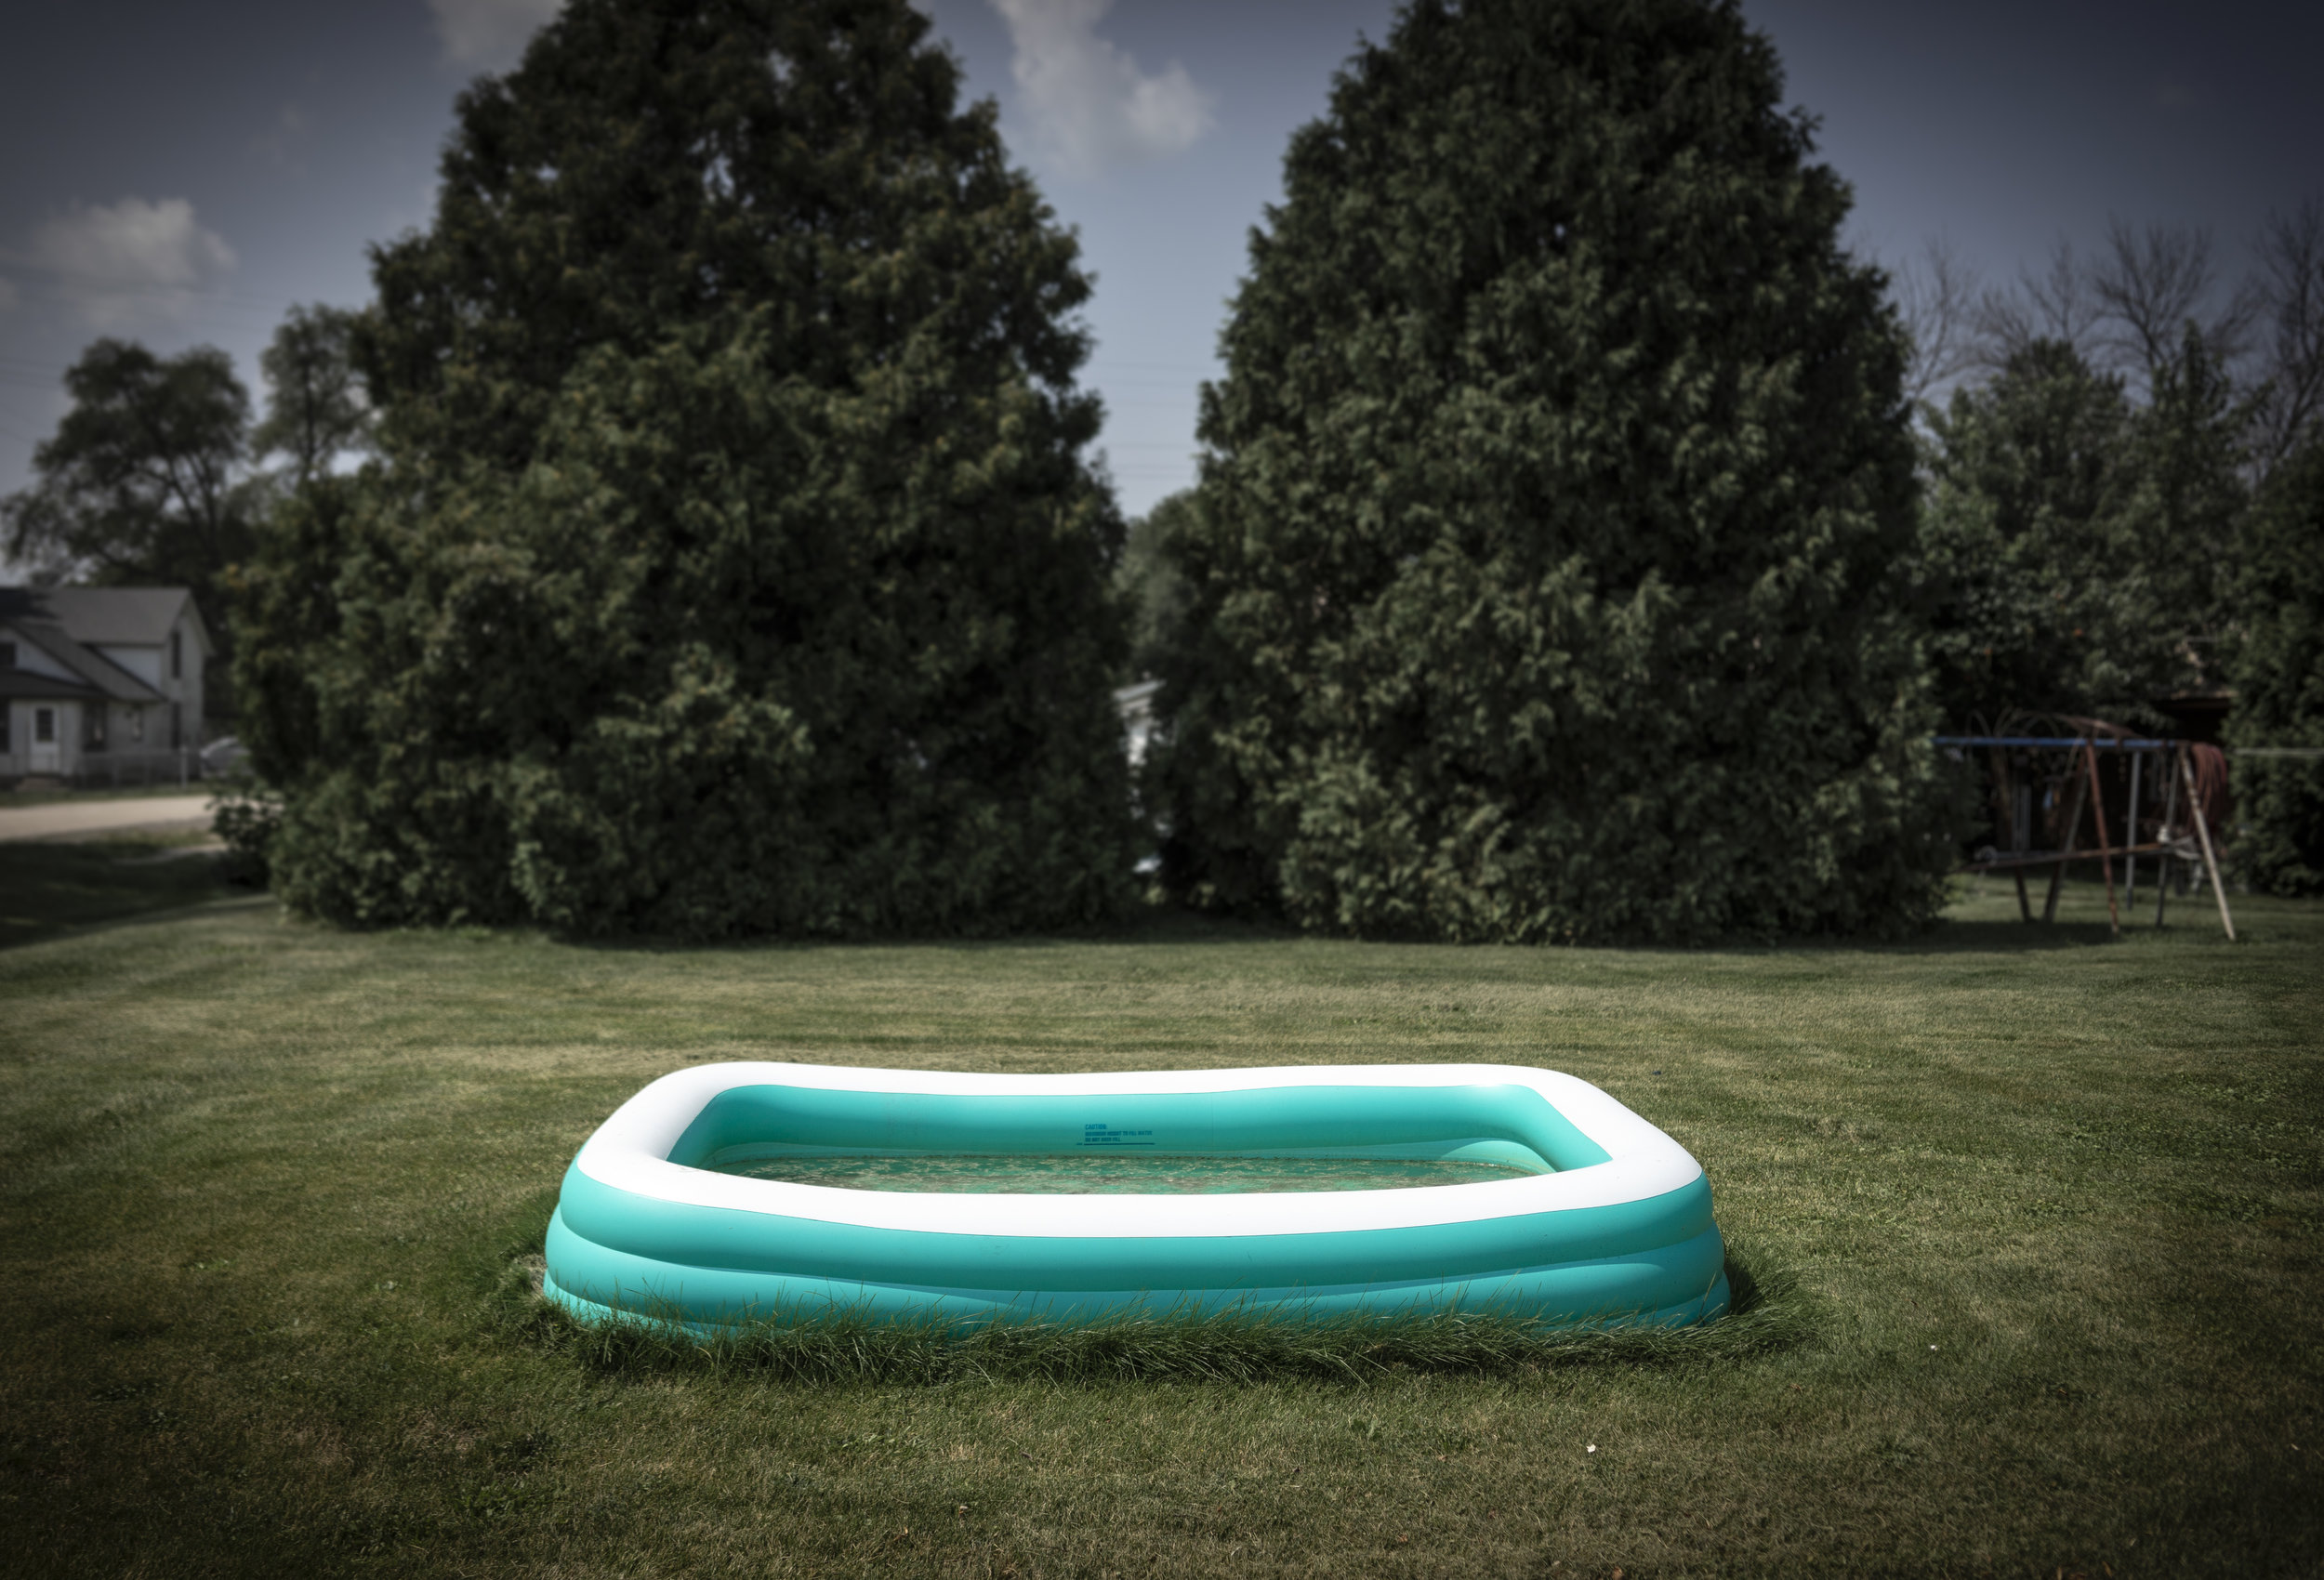 Pool on the grass_1.JPG